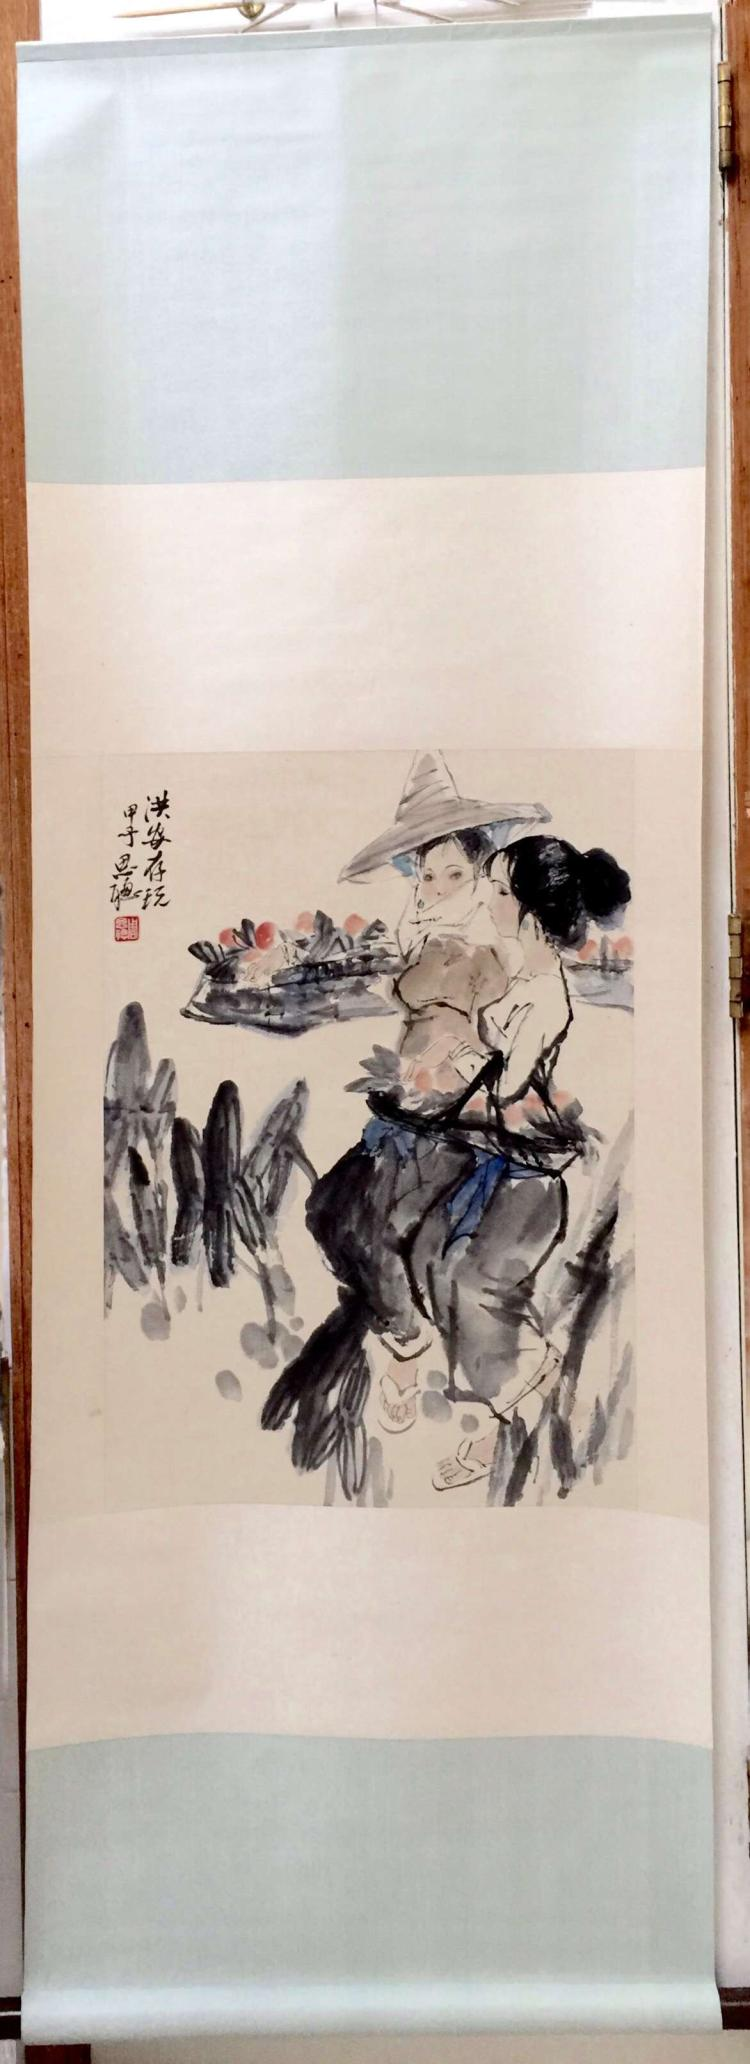 CHINESE PAINTING MARKED ZHOUSICONG